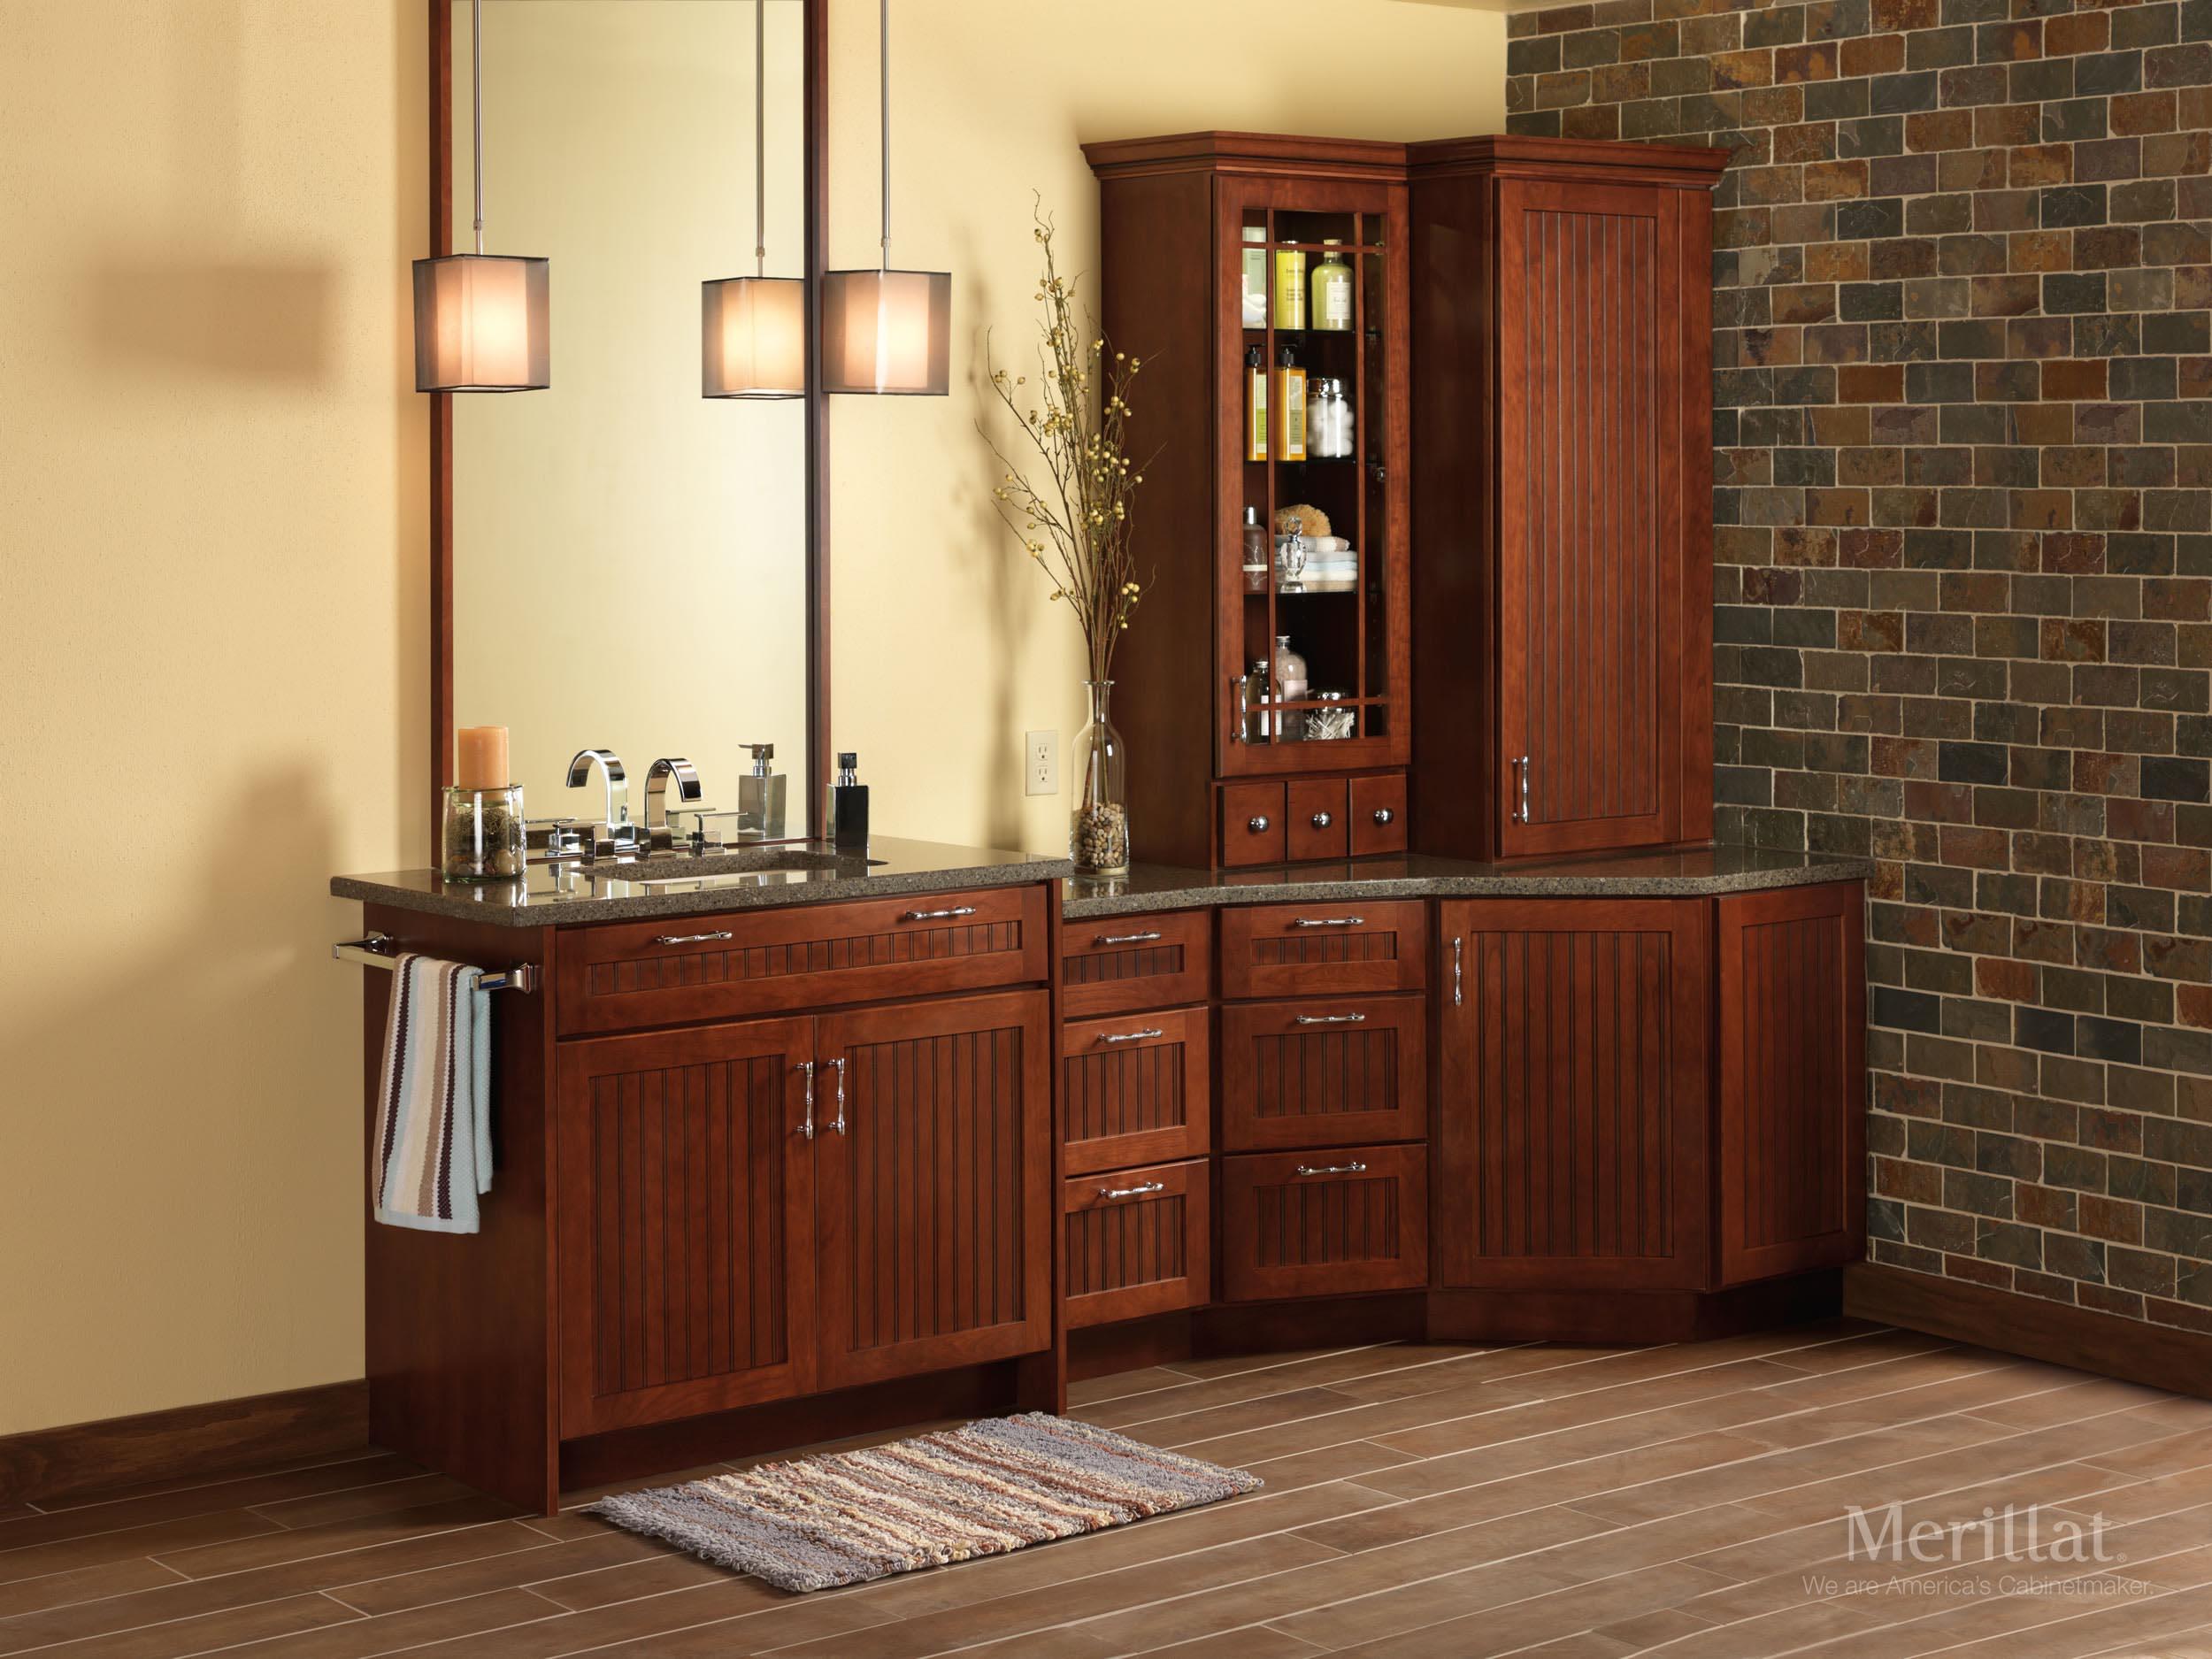 Merrilat Kitchen Cabinets